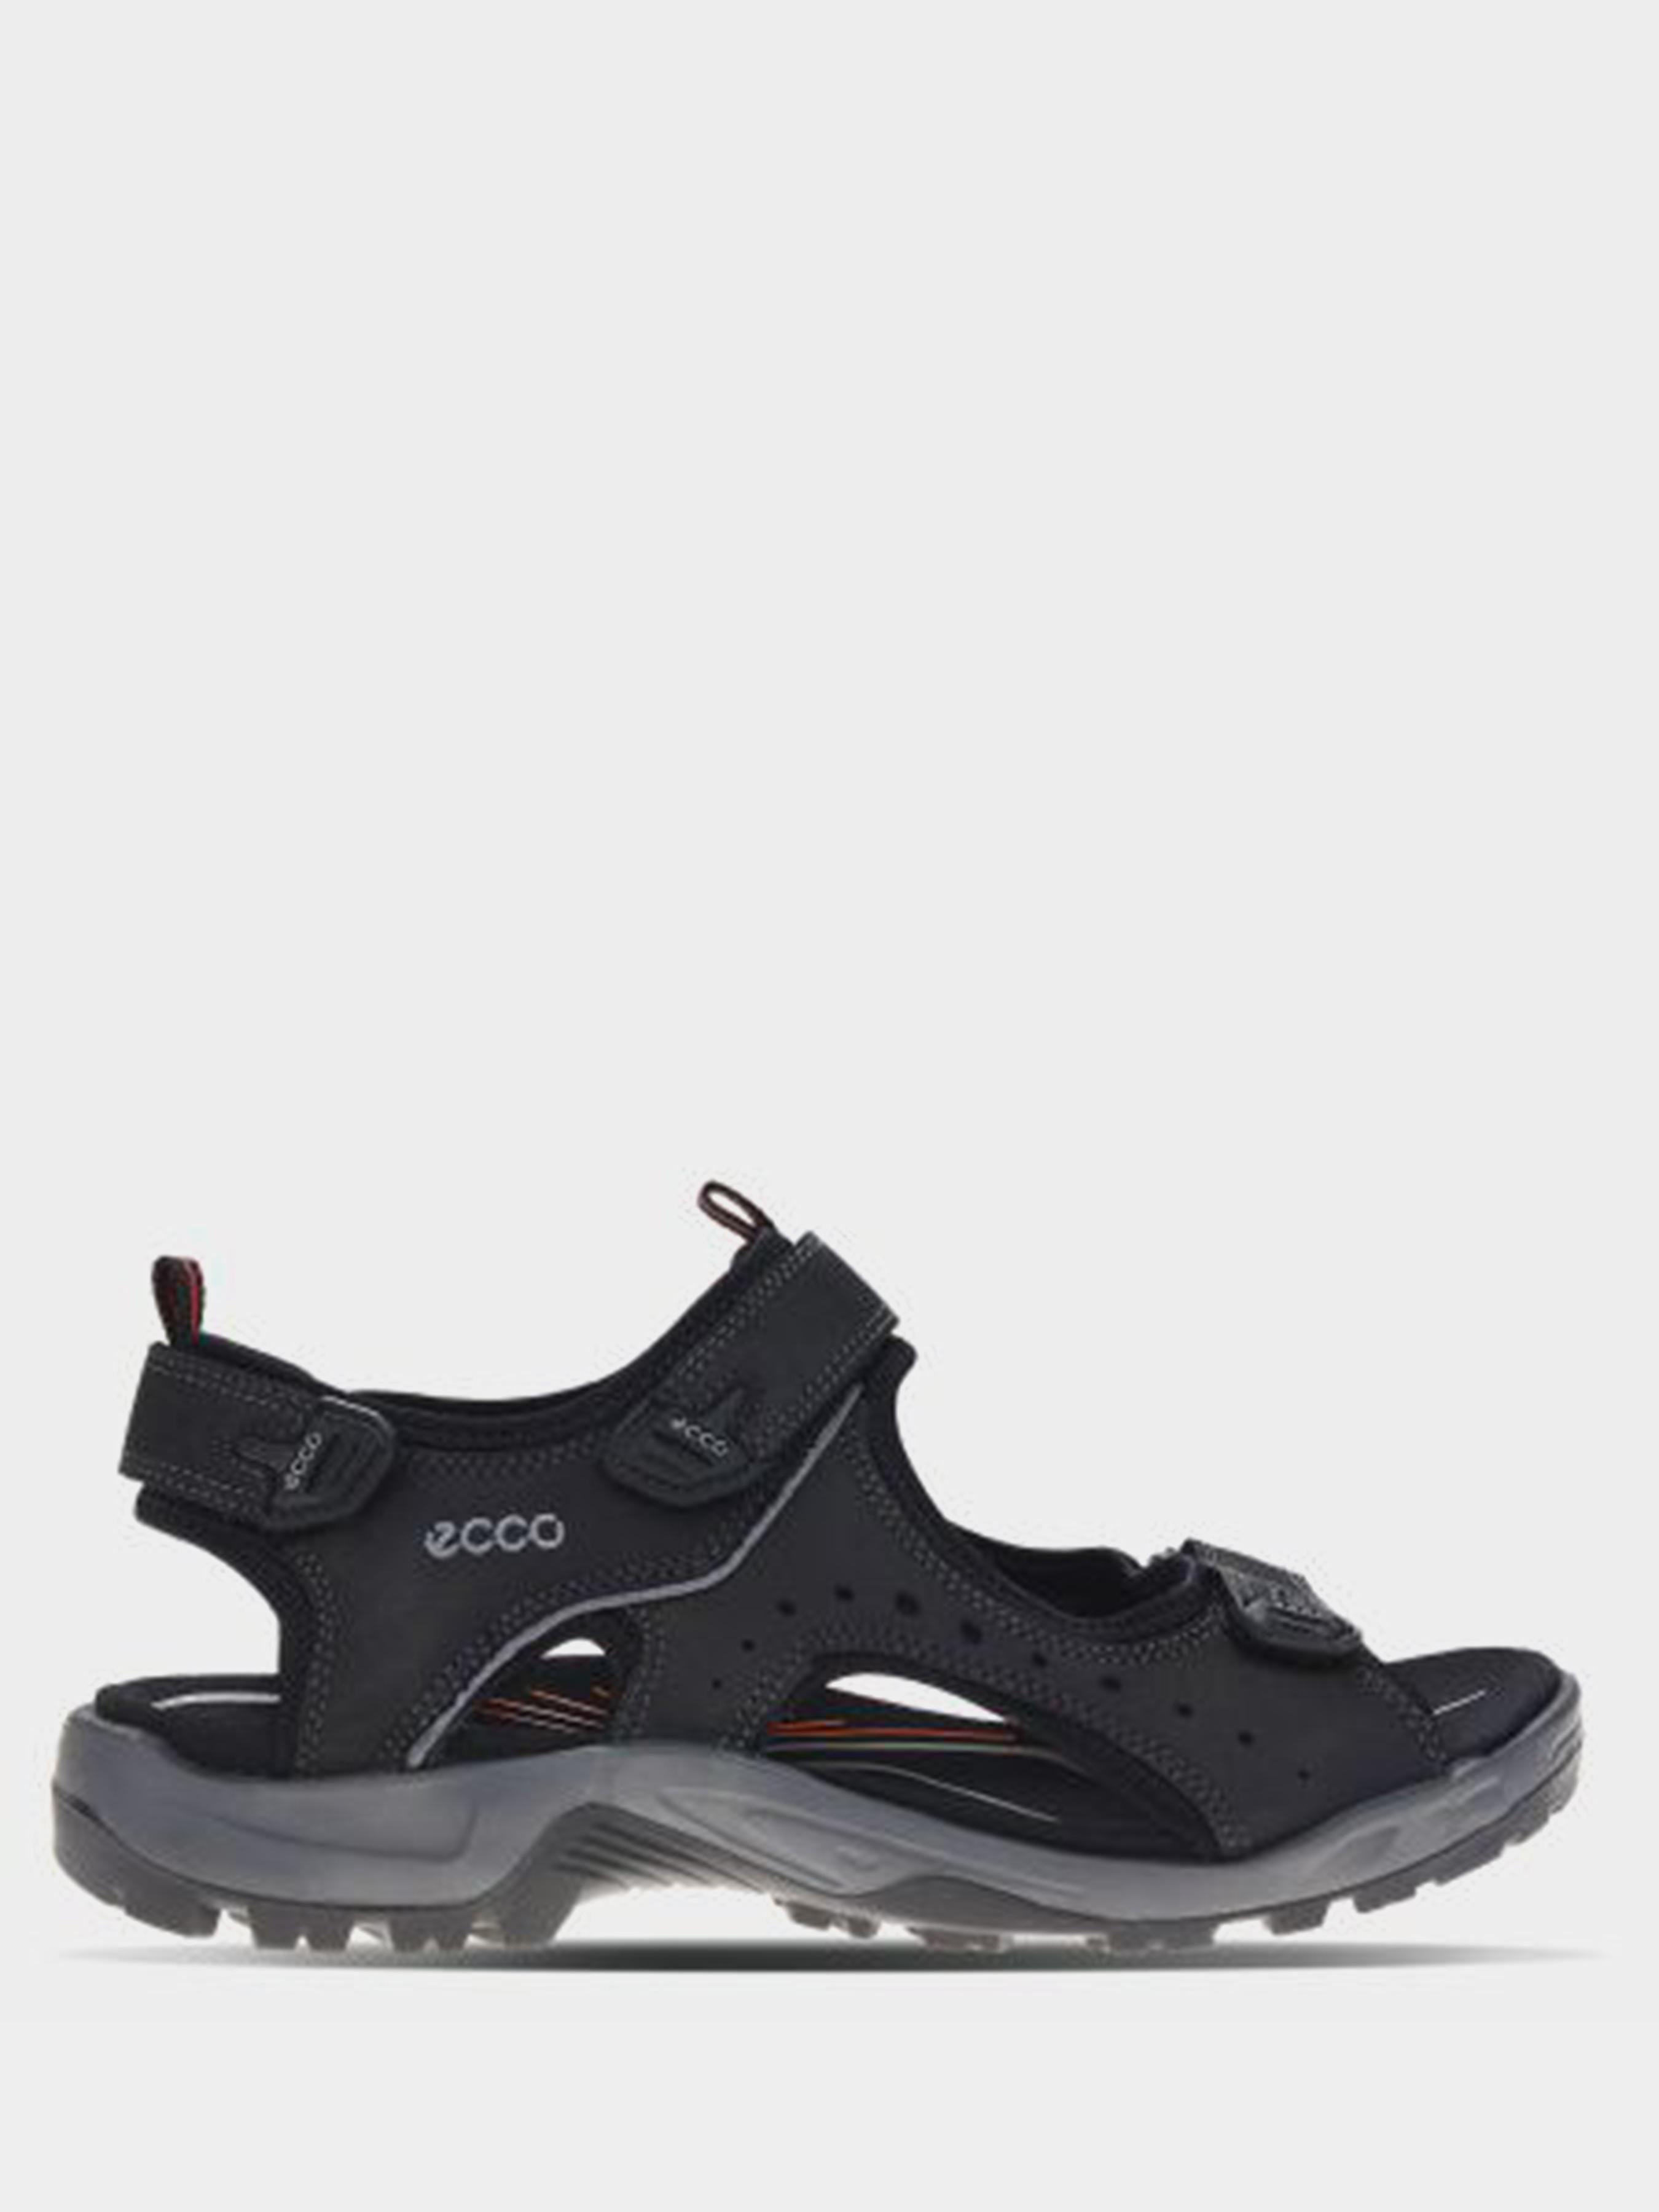 ECCO Сандалі чоловічі модель ZM3377. Сандалі для чоловіків ECCO OFFROAD  ZM3377 розміри взуття 2cb186521dcde